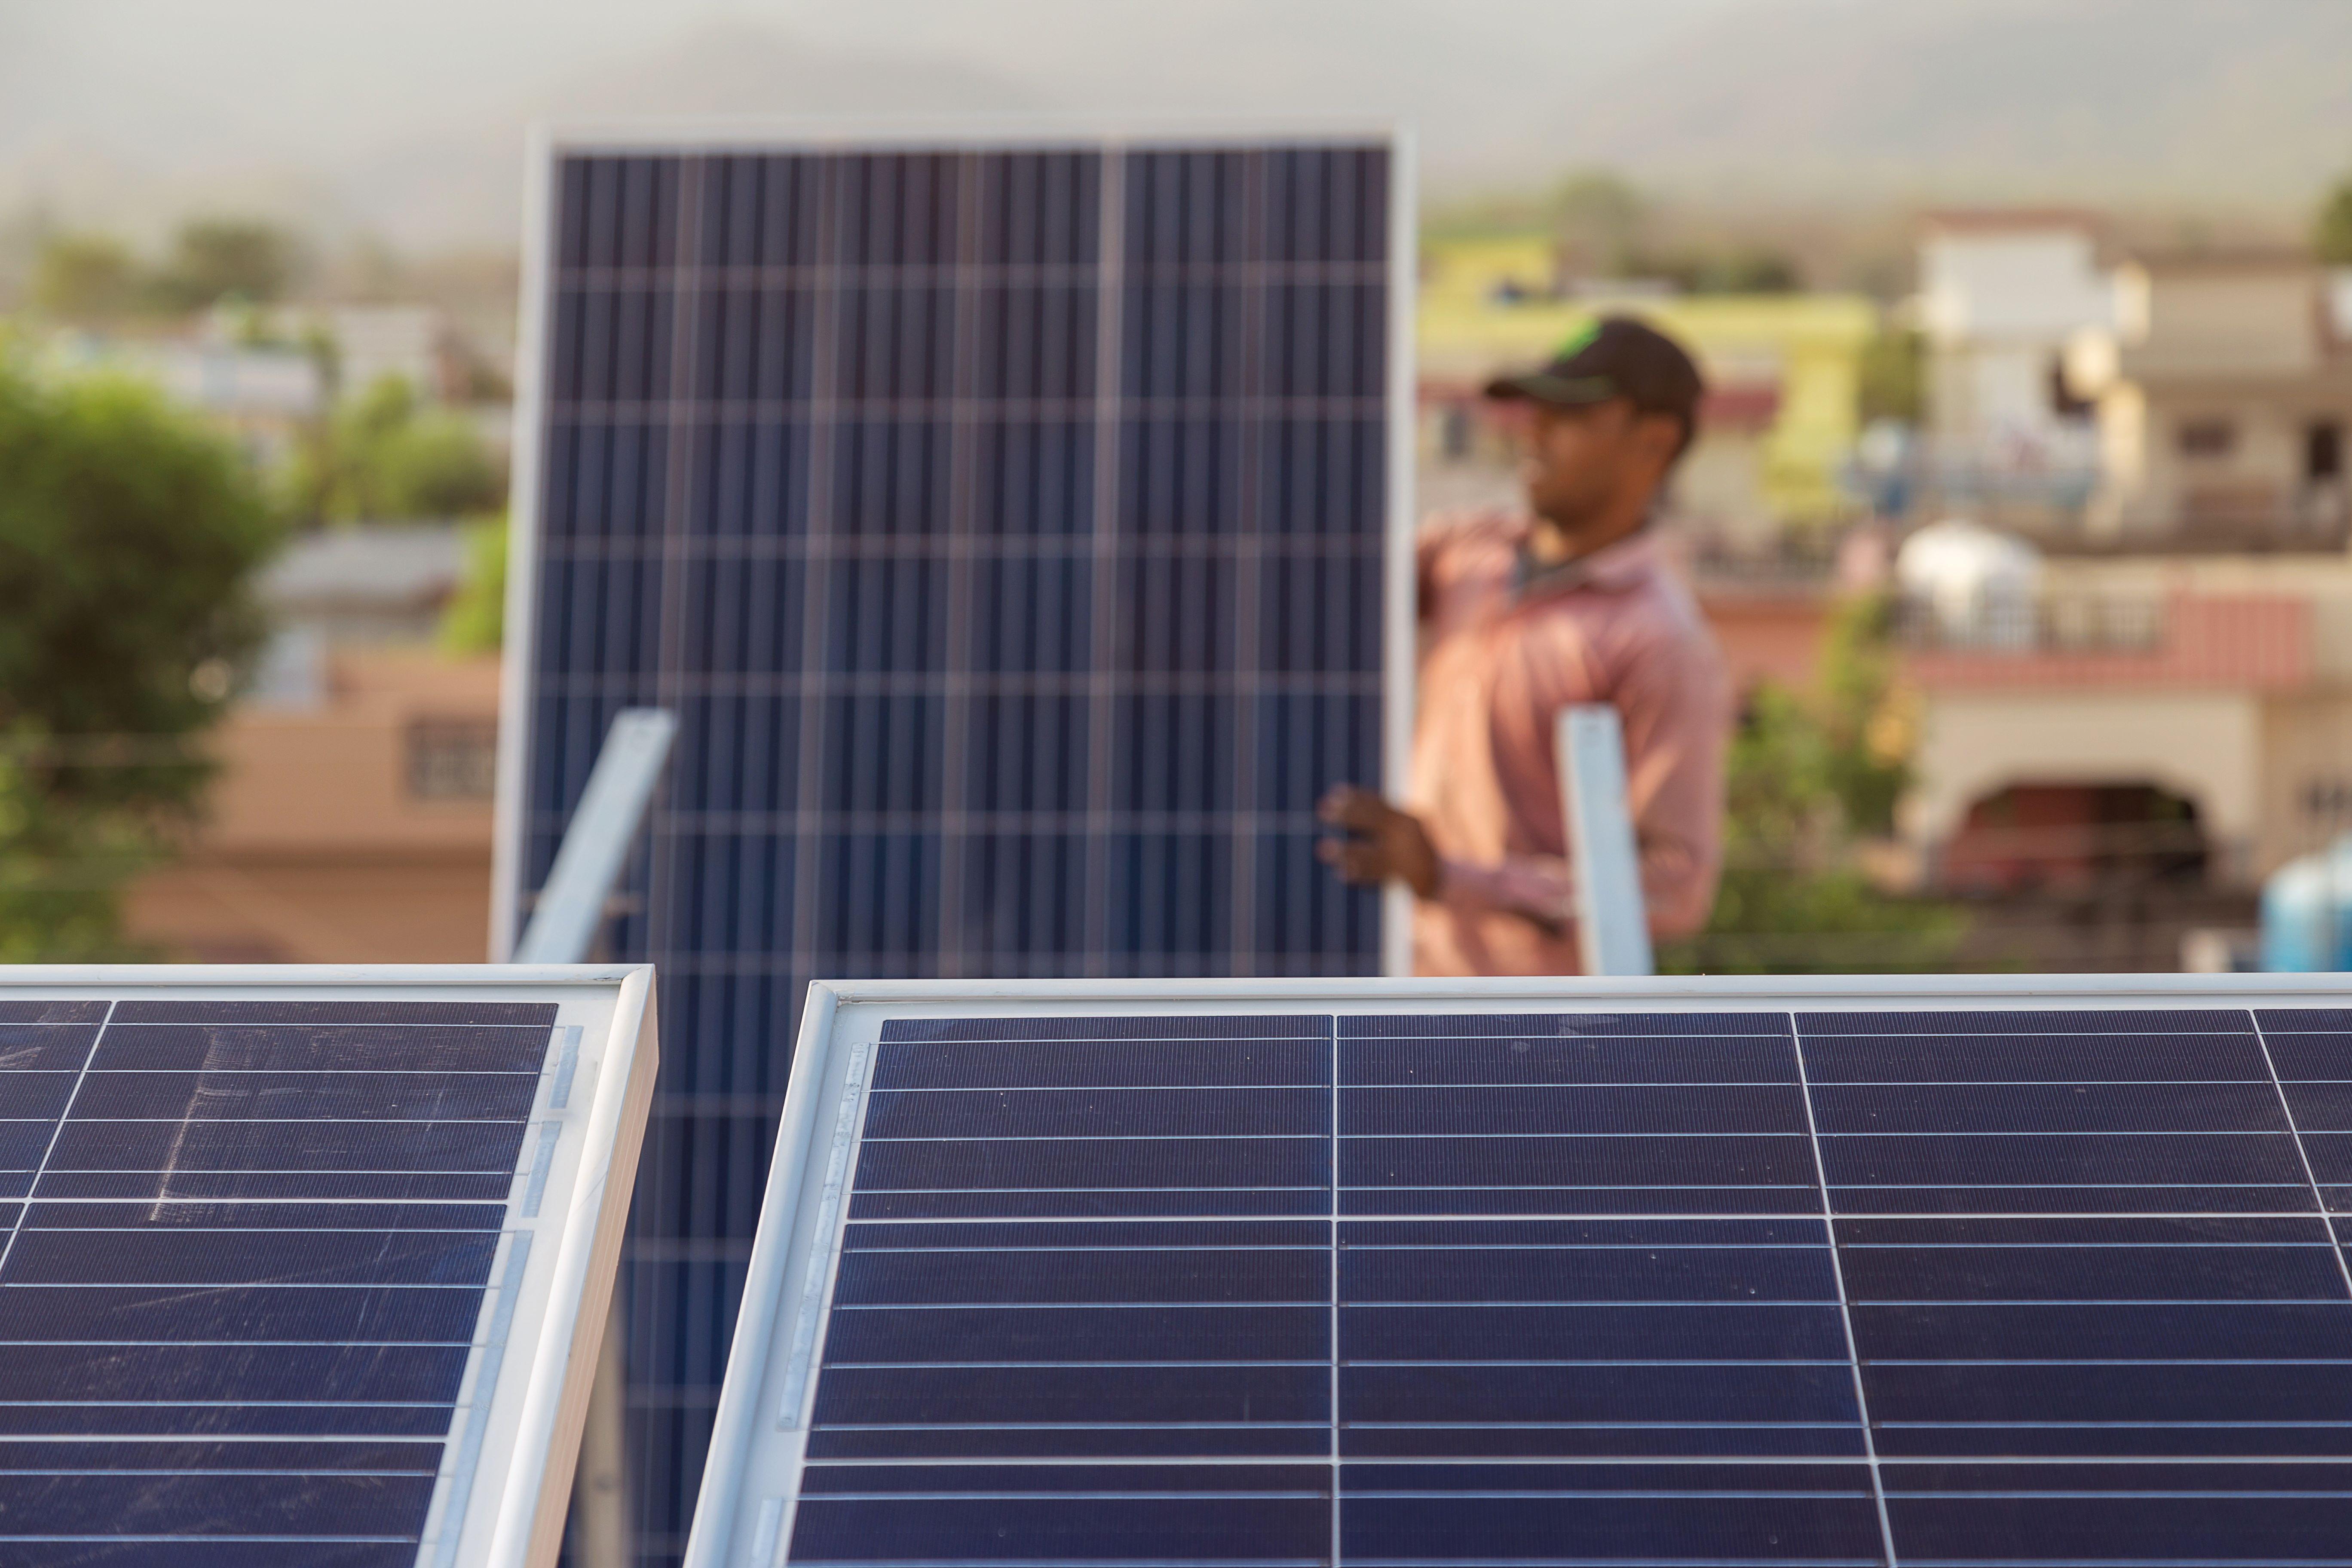 Solar panel installation in Indian village